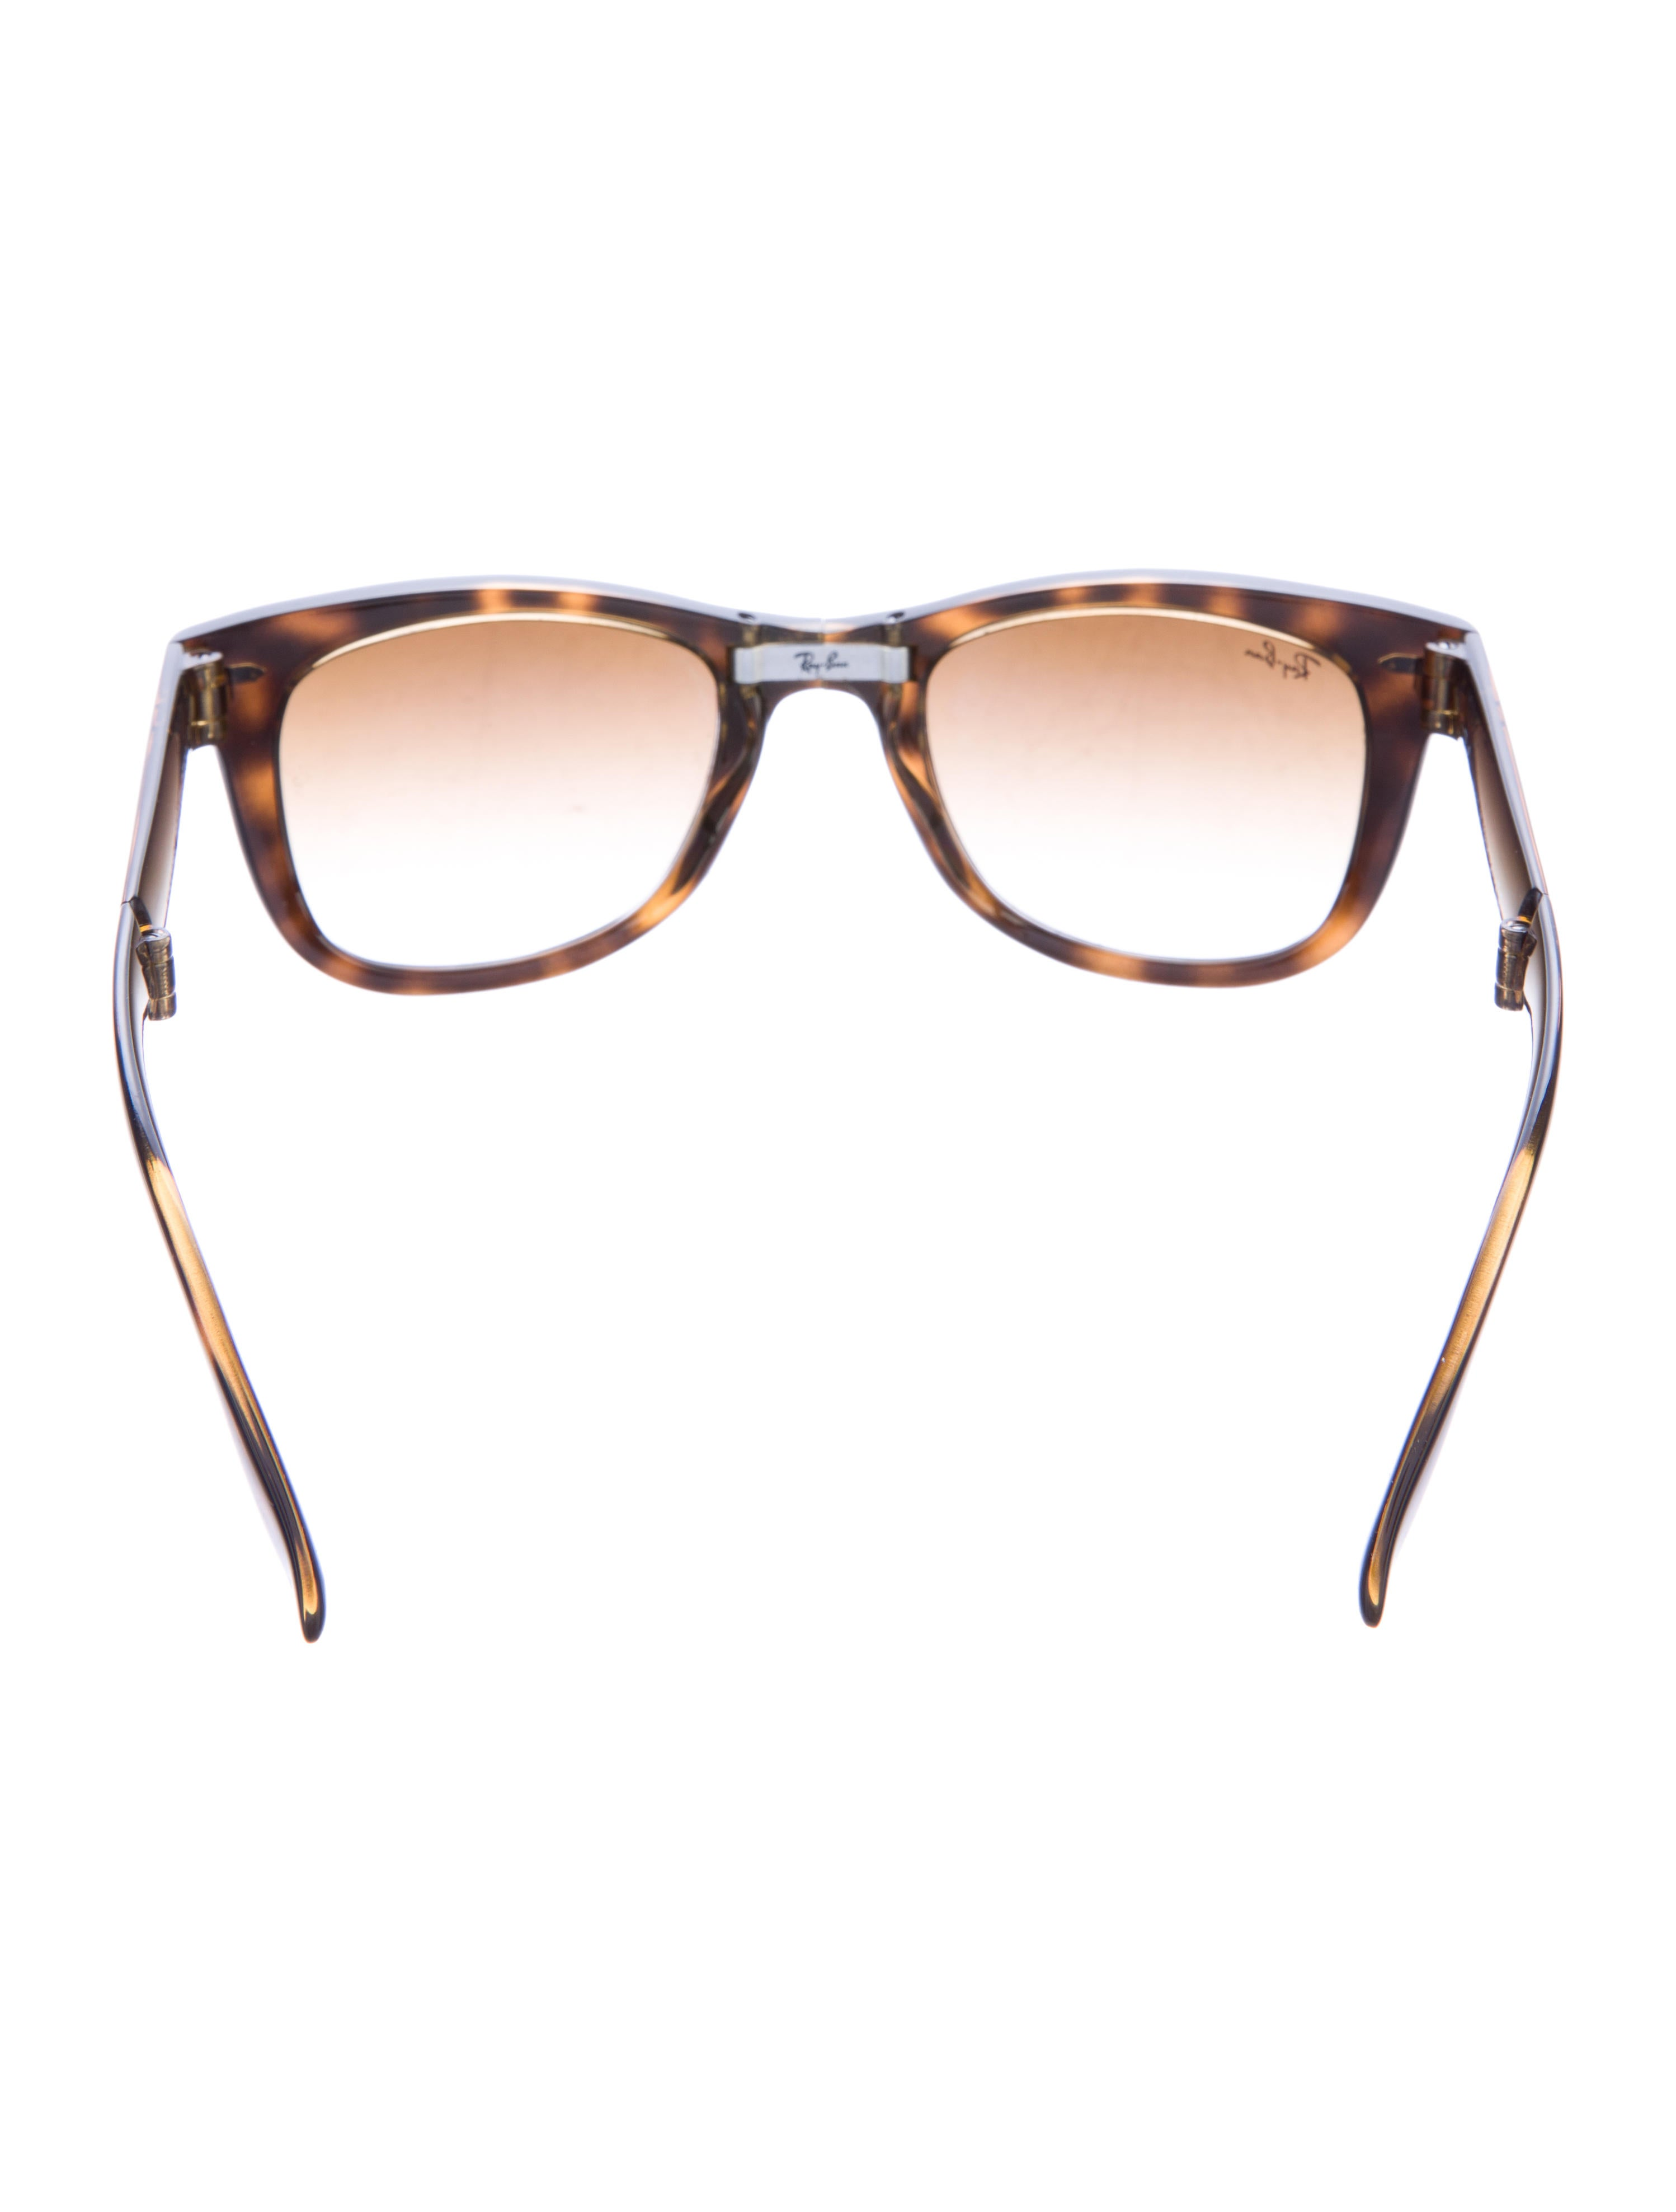 2ba3c147b7d Folding Ray Ban Cases For Sunglasses « Heritage Malta